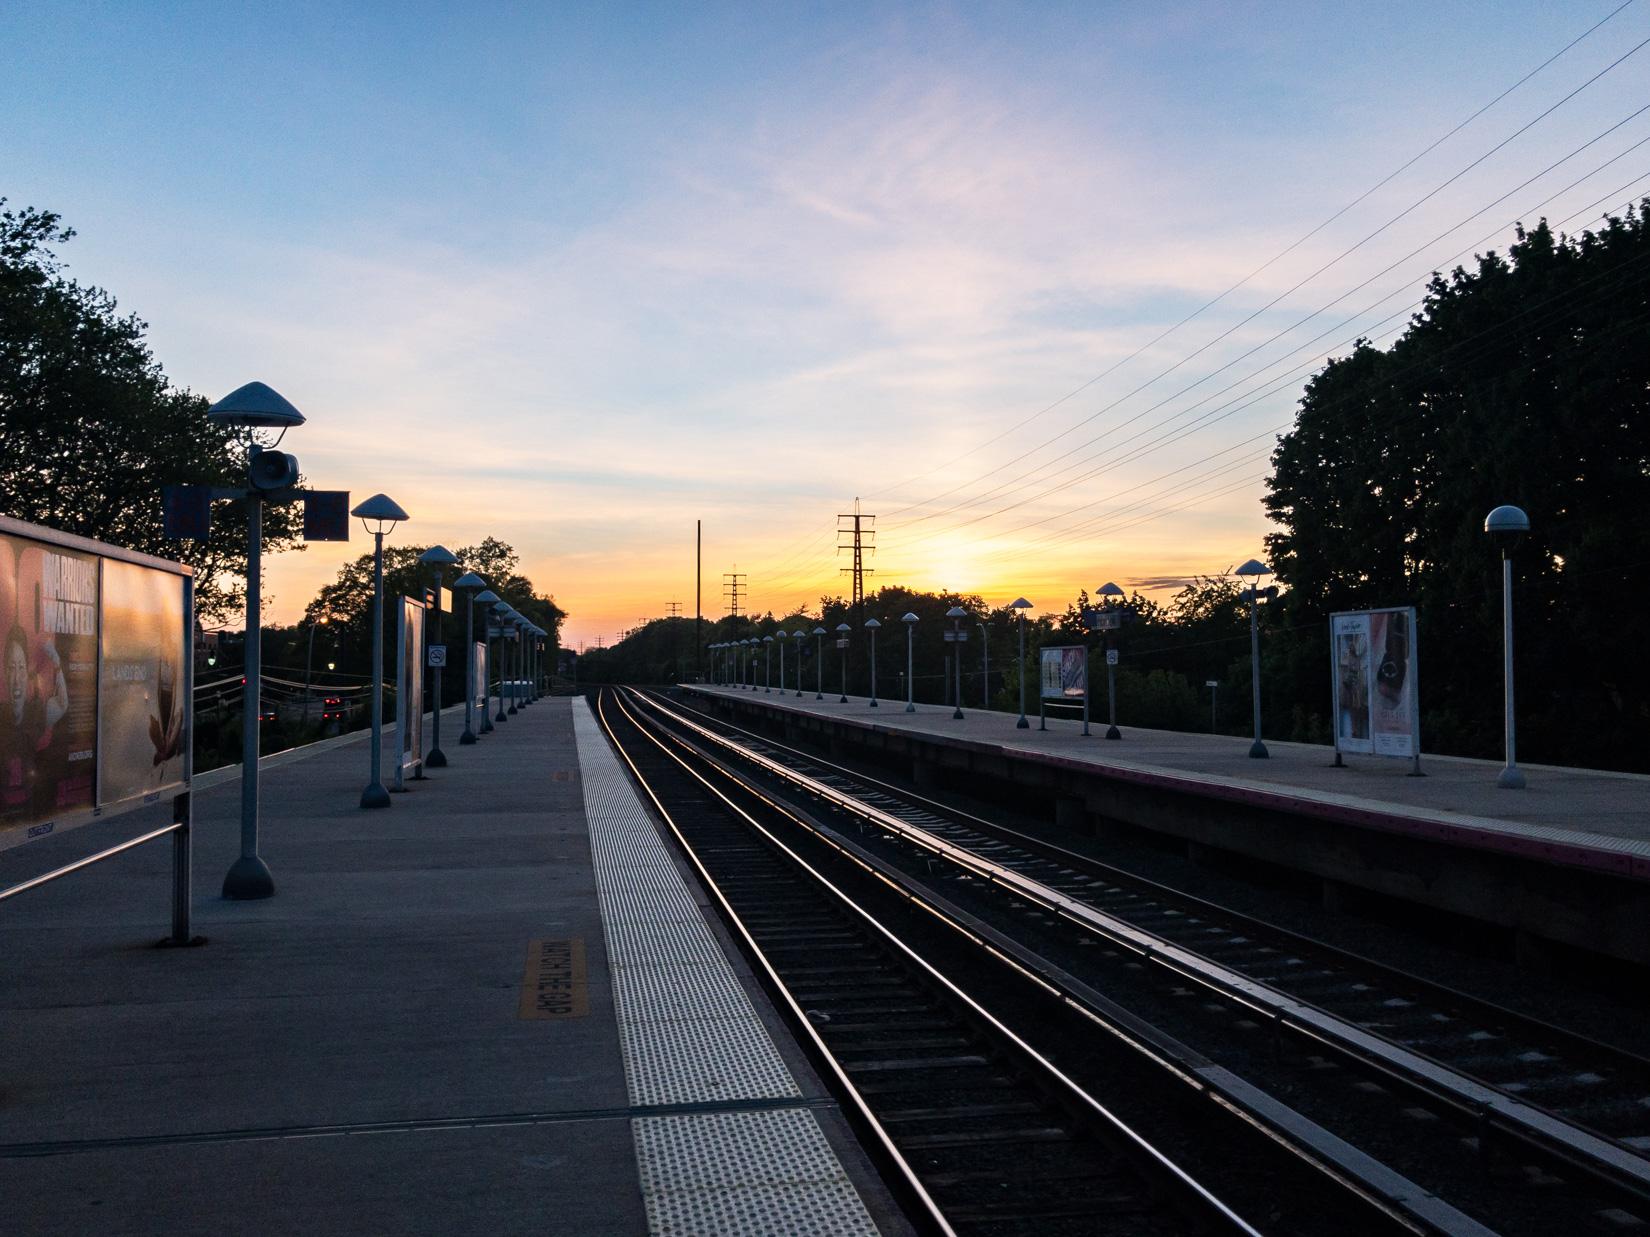 Sunset Over Train Platform and Tracks